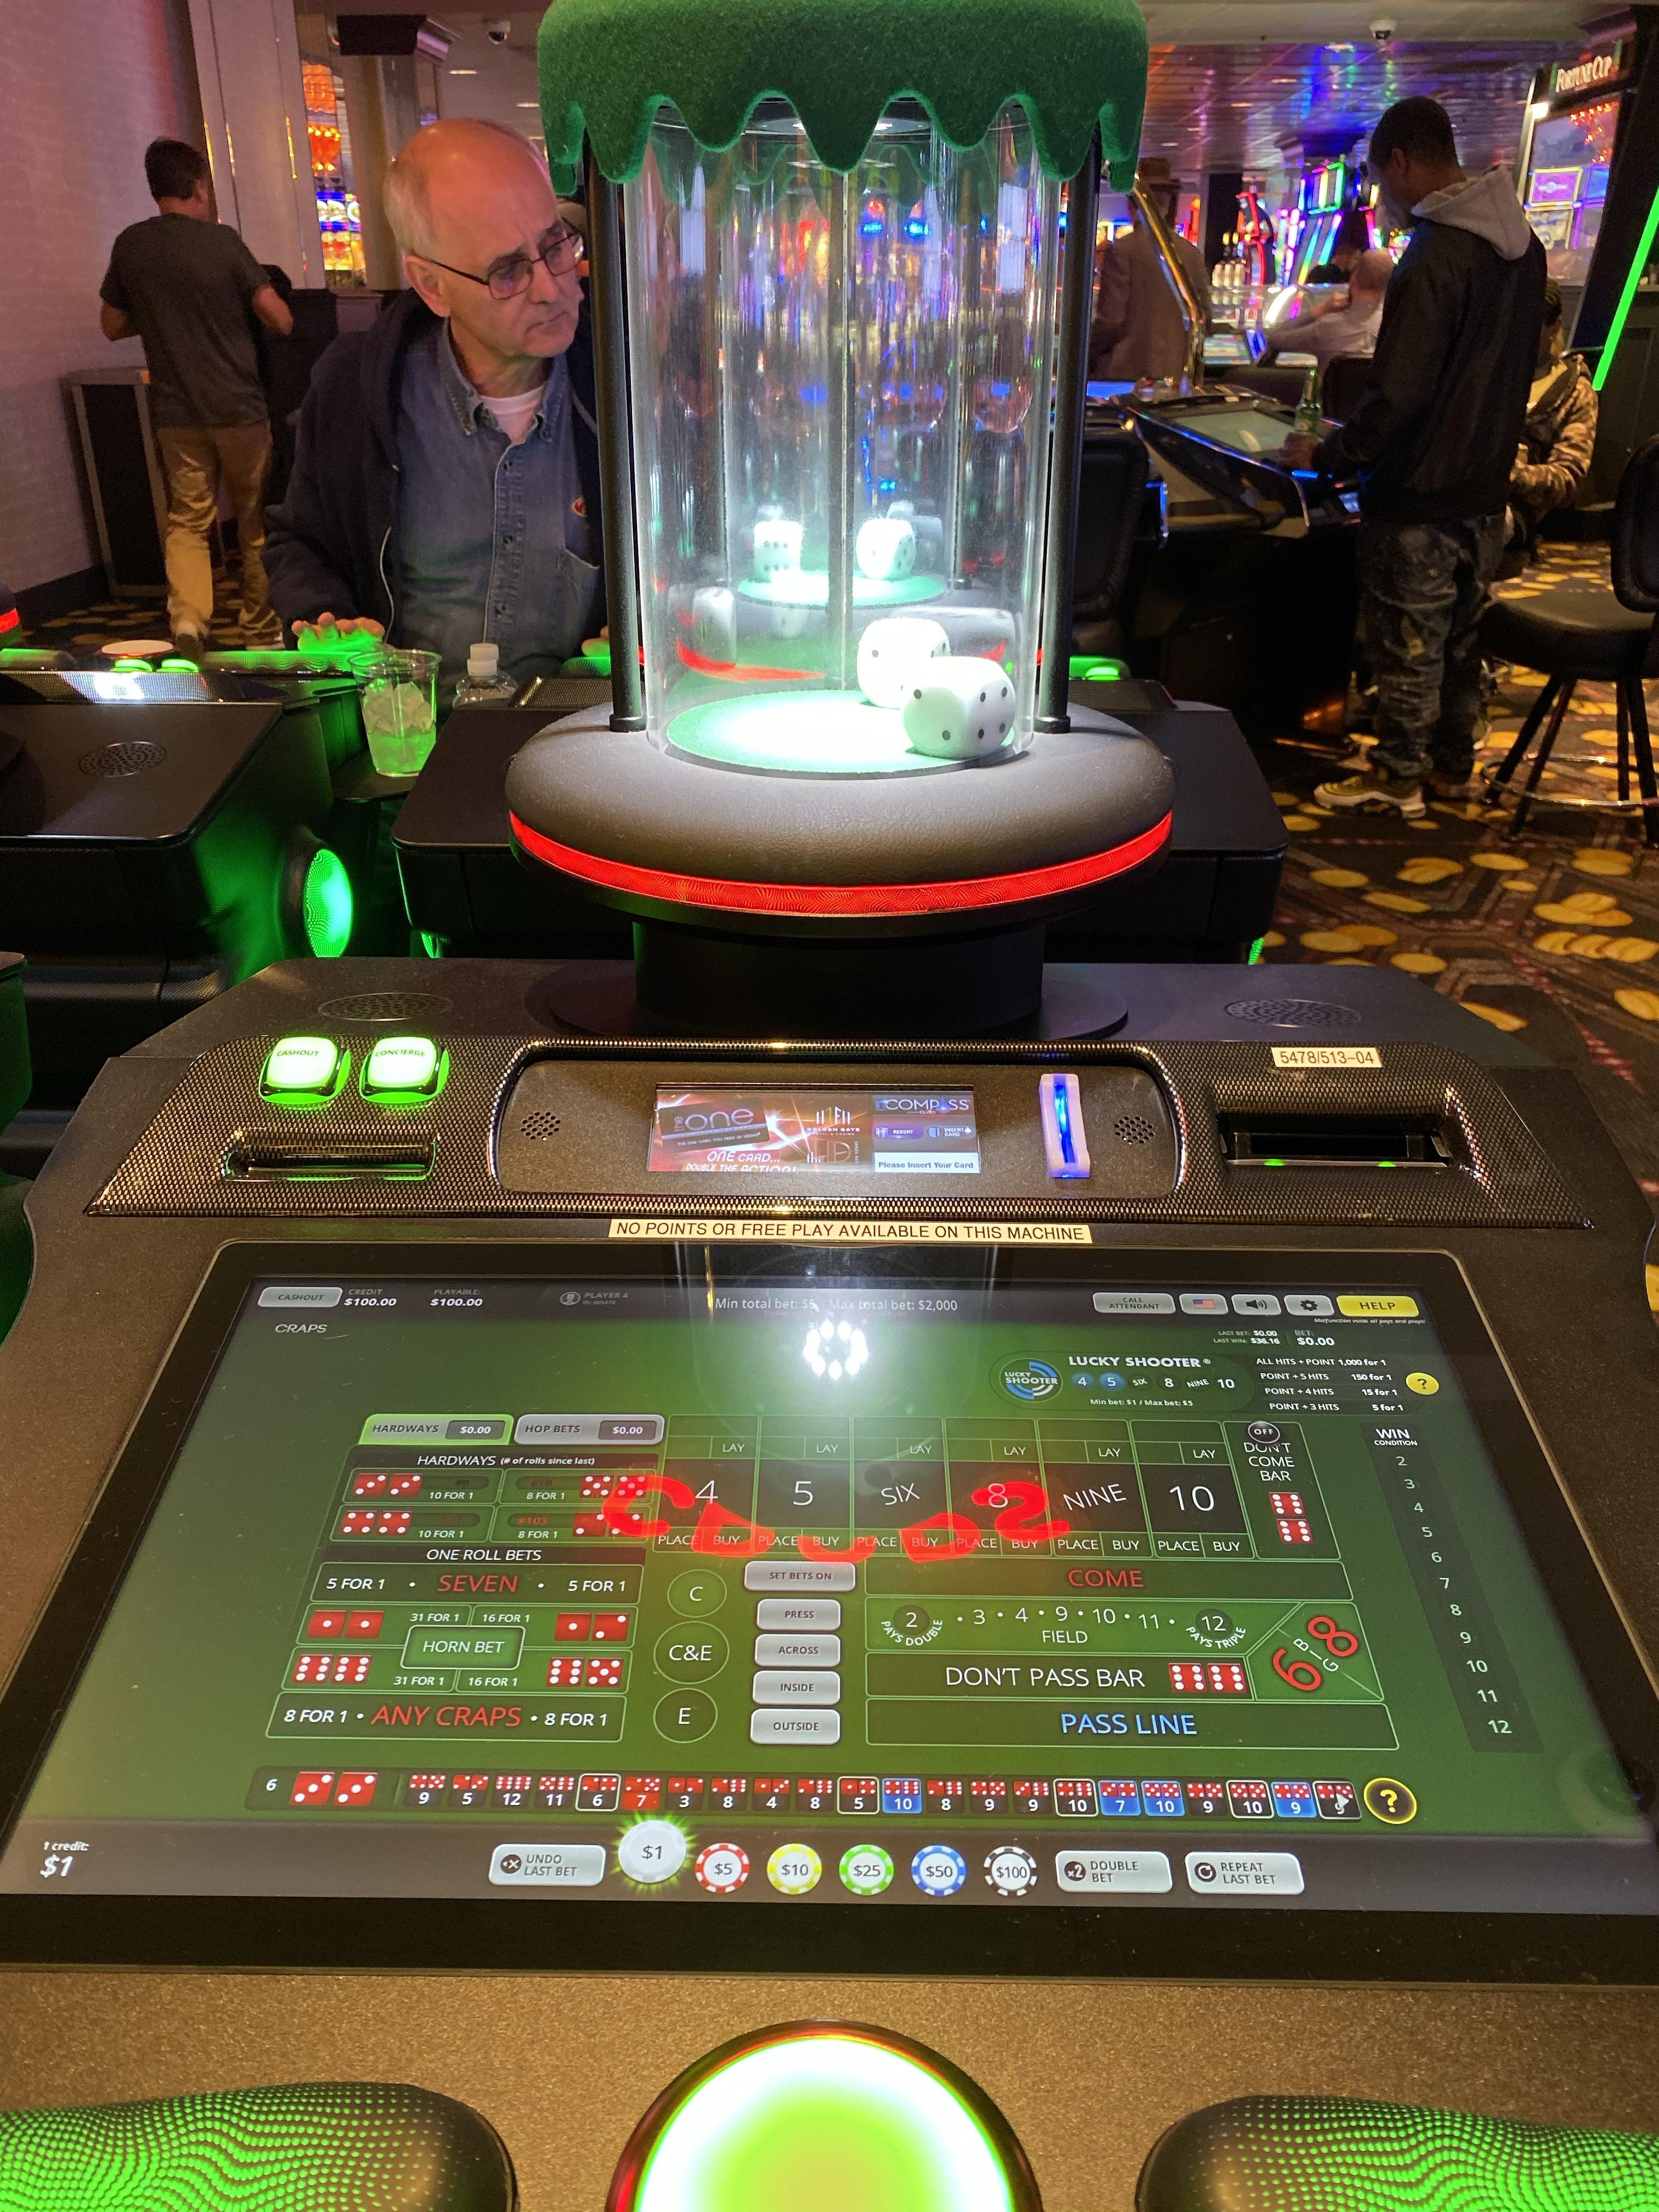 Reasons for gambling in singapore